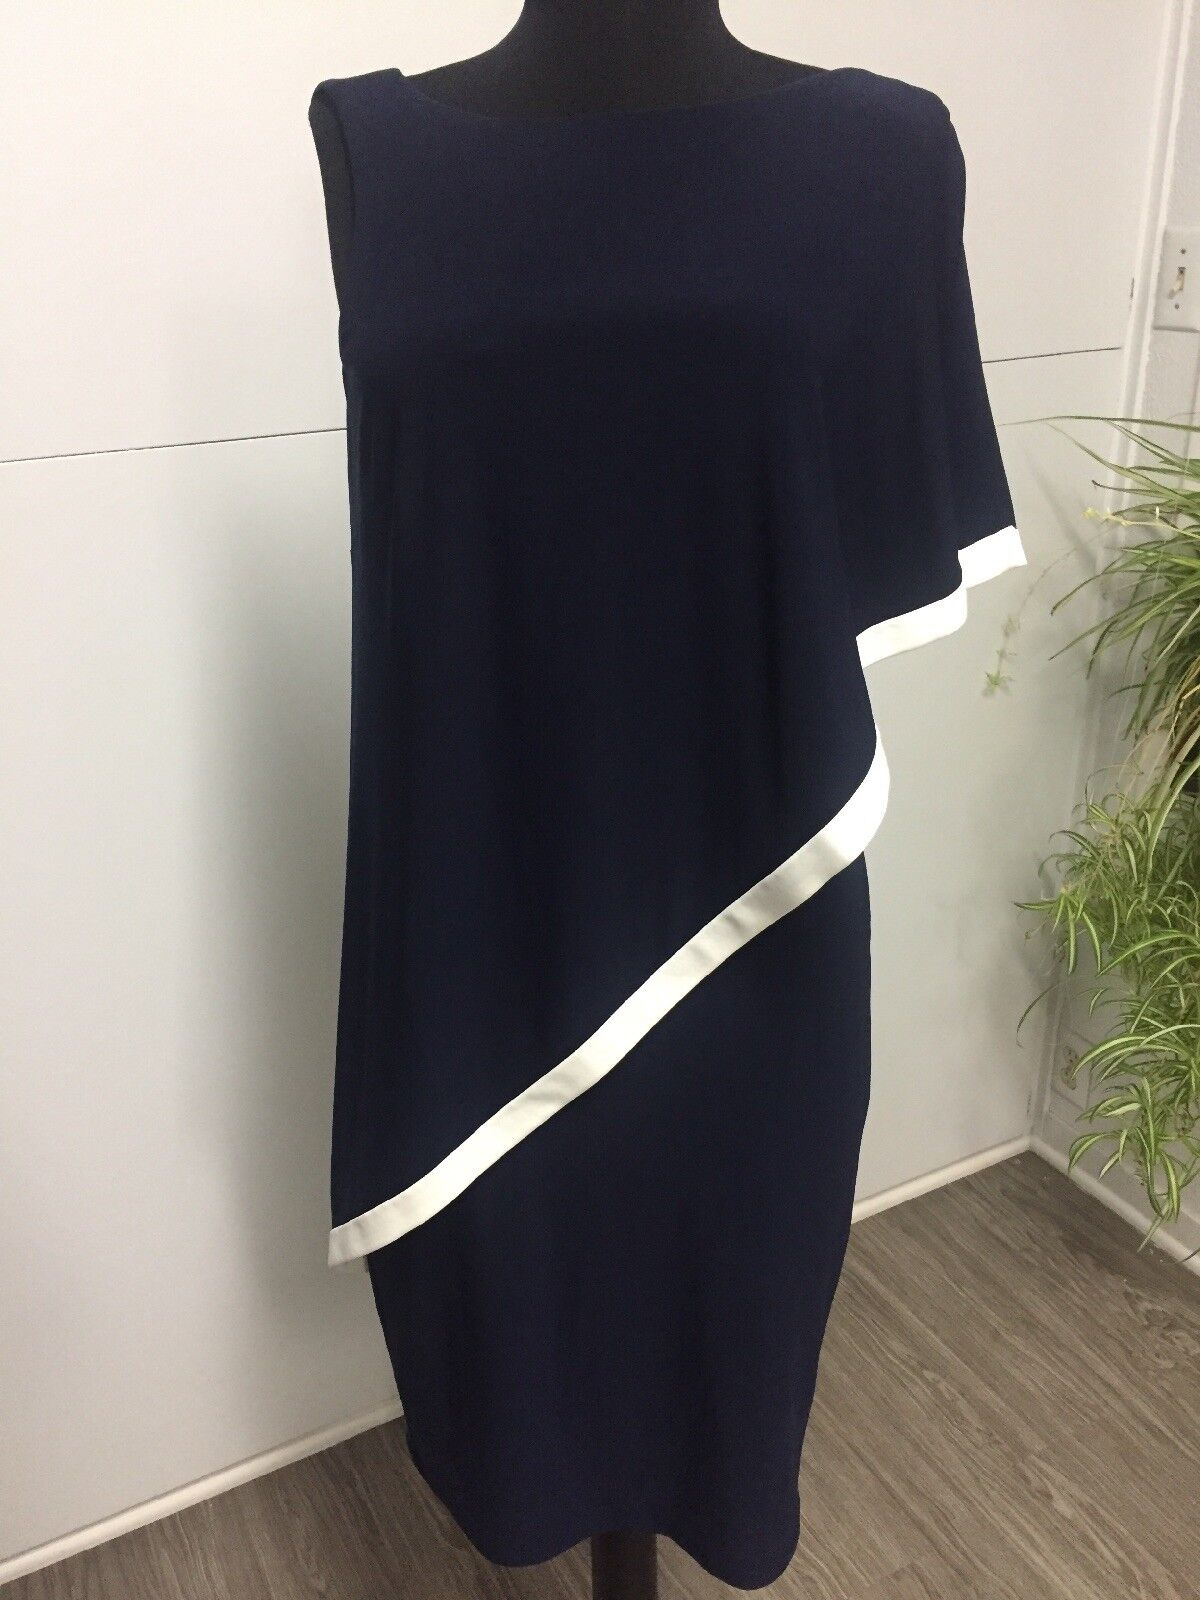 NWT  135 Ralph Ralph Ralph Lauren One Shoulder Dress Navy white Nautical Look Size 4 397193